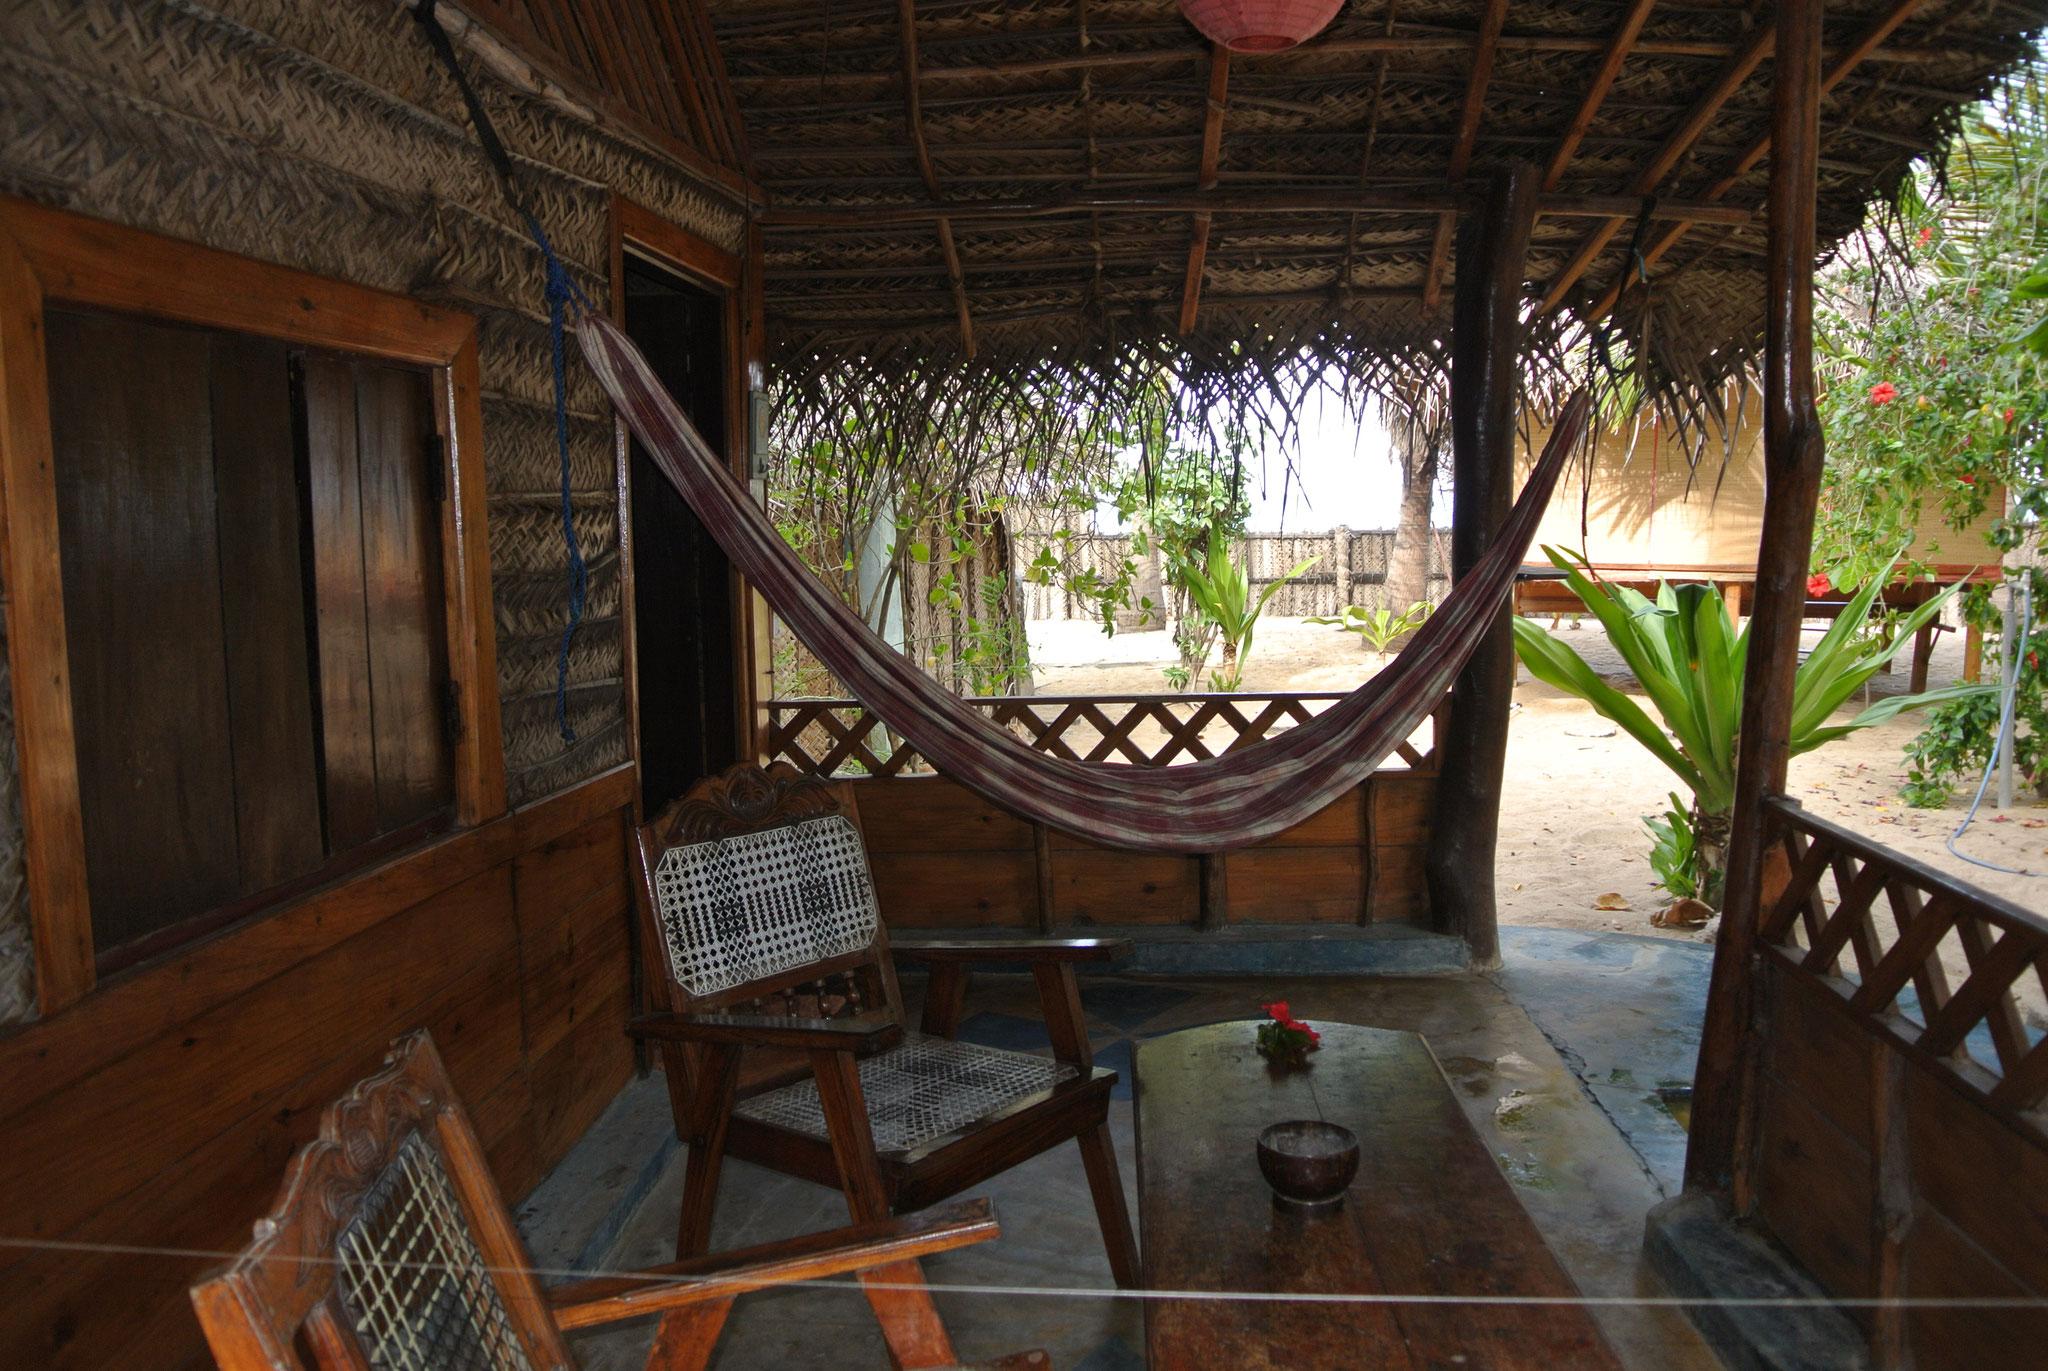 The Noa Cabana